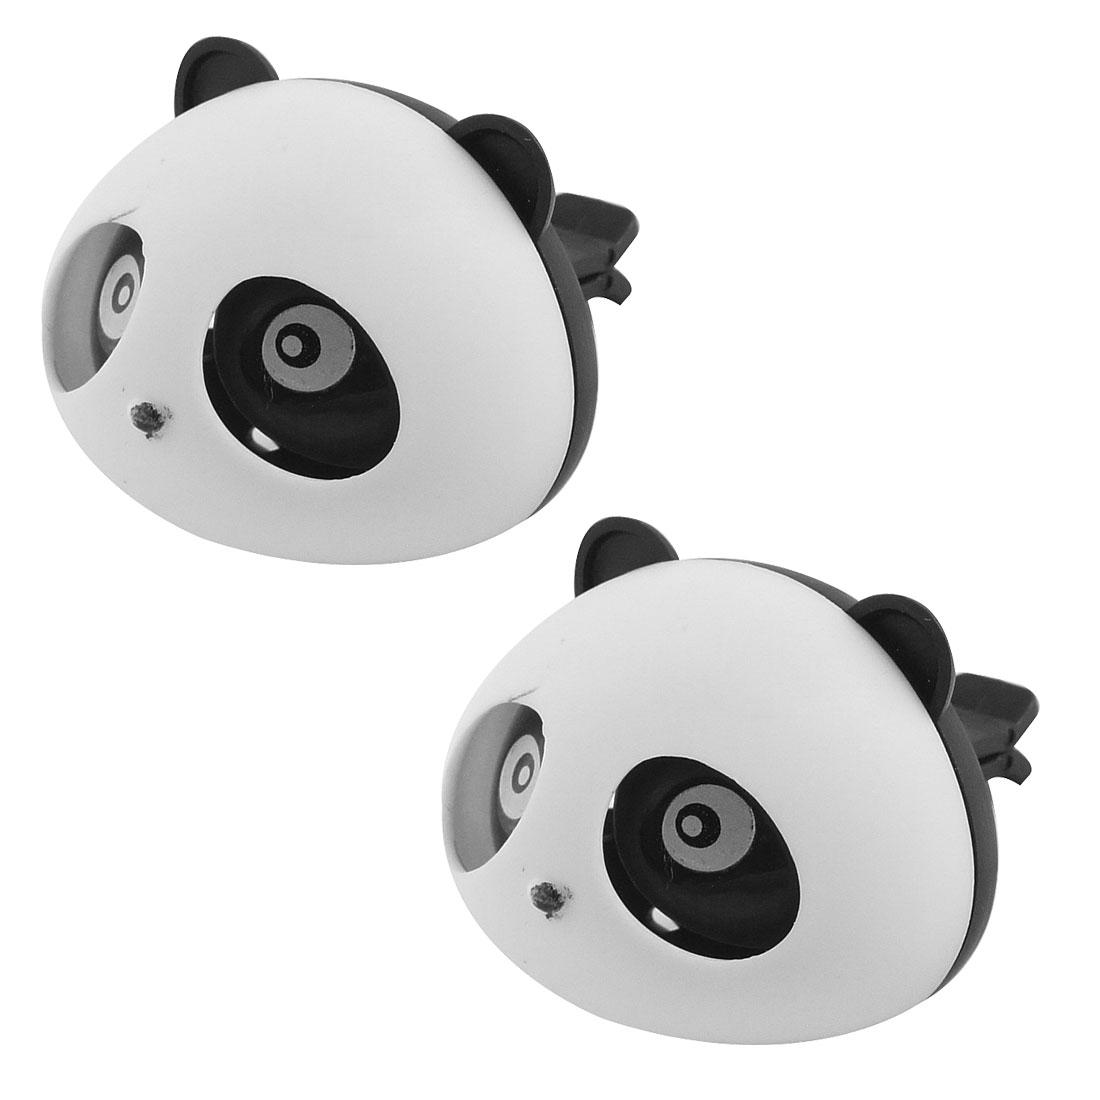 2 Pcs Black White Panda Shaped Car Air Freshener Perfume w Two Clips